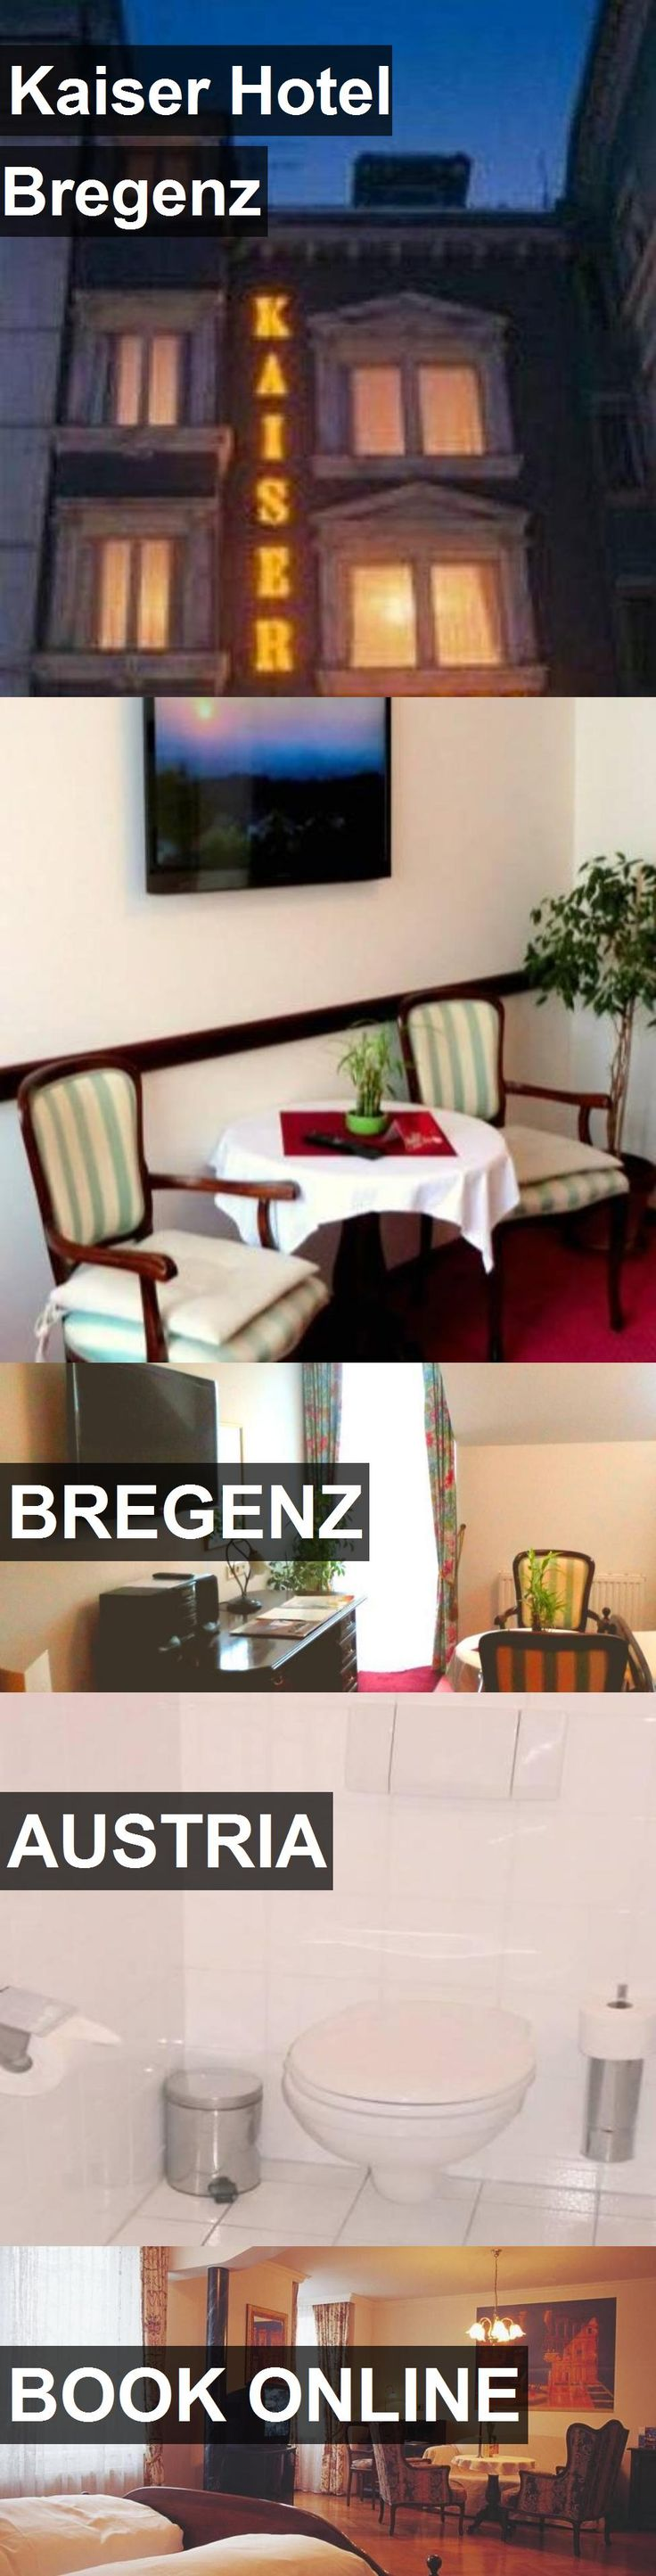 Kaiser Hotel Bregenz in Bregenz, Austria. For more information, photos, reviews and best prices please follow the link. #Austria #Bregenz #travel #vacation #hotel